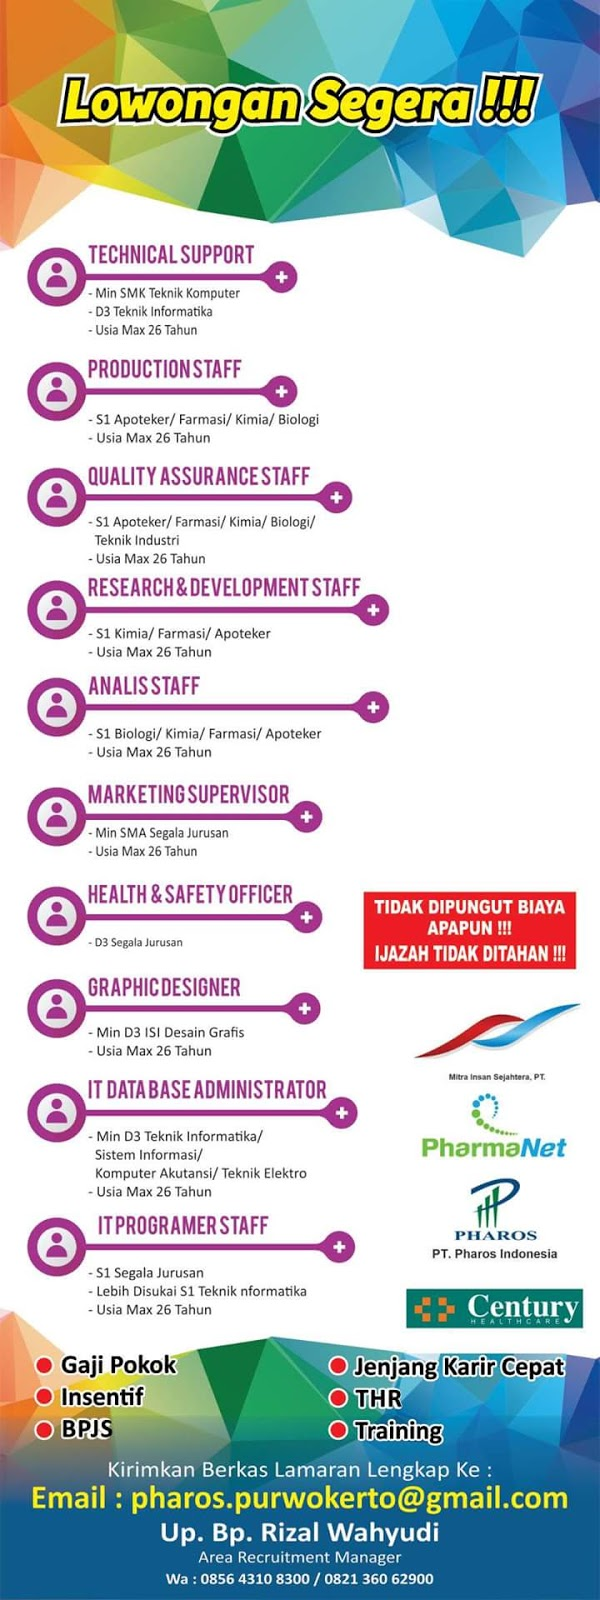 Loker PT Pharos Indonesia Cabang Purwokerto | Loker Satria